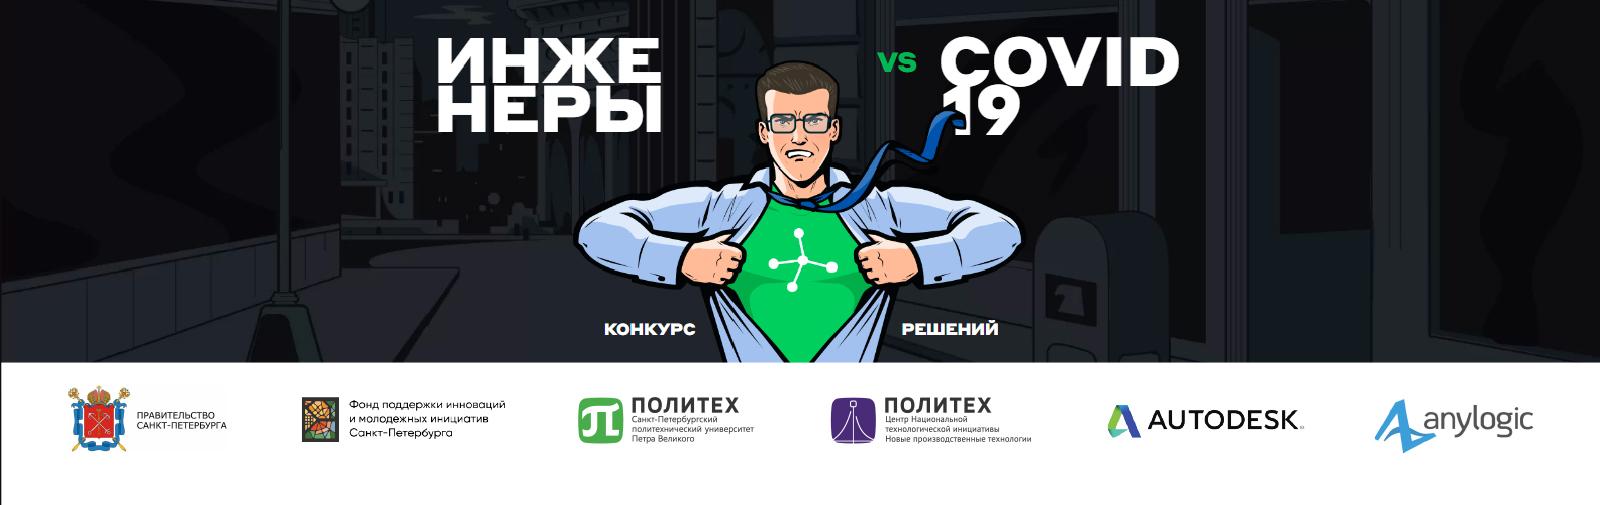 конкурс ковид